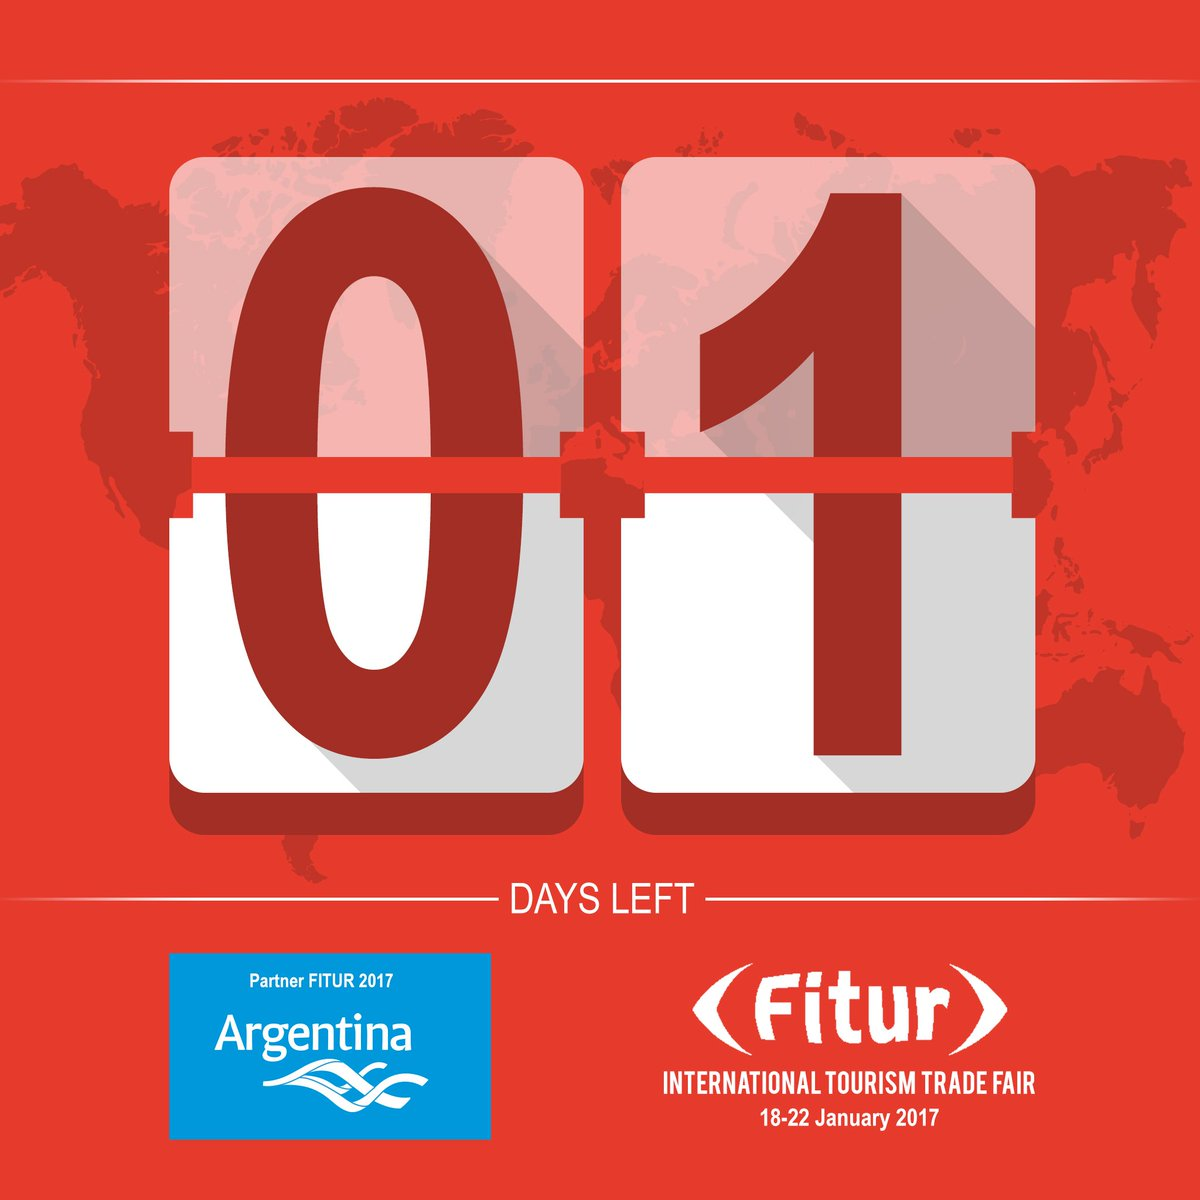 Tic, tac, tic, tac... ⌛️ 😱 #Fitur2017 https://t.co/0O8tneIukn